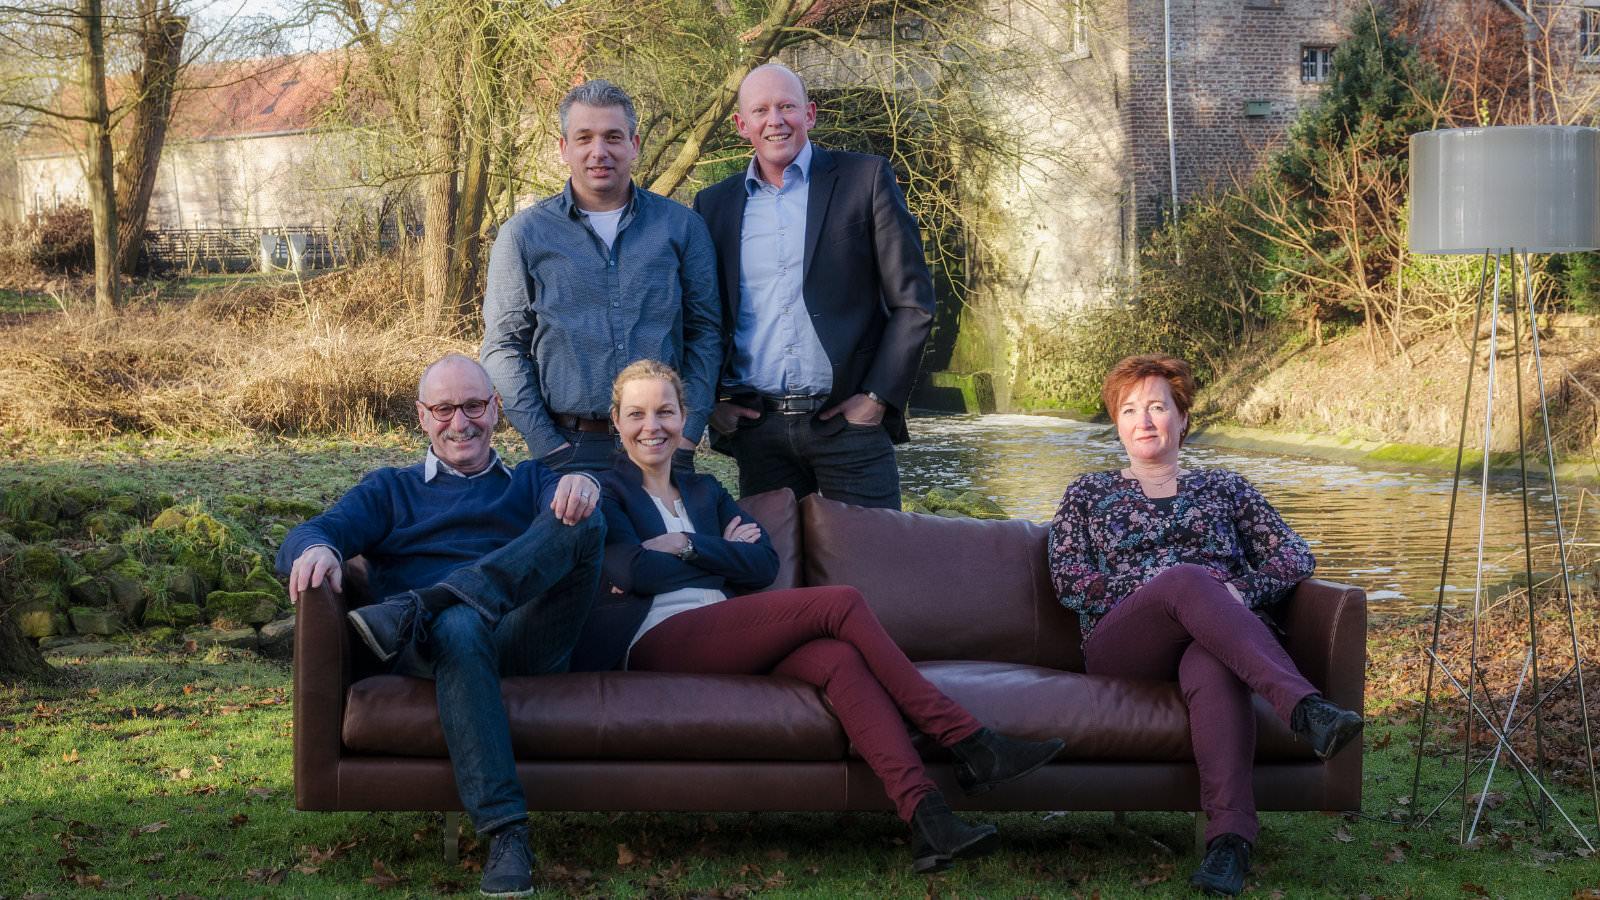 https://ploemen.nl/wp-content/uploads/2016/02/team_ploemen_interieur_sittard.jpg